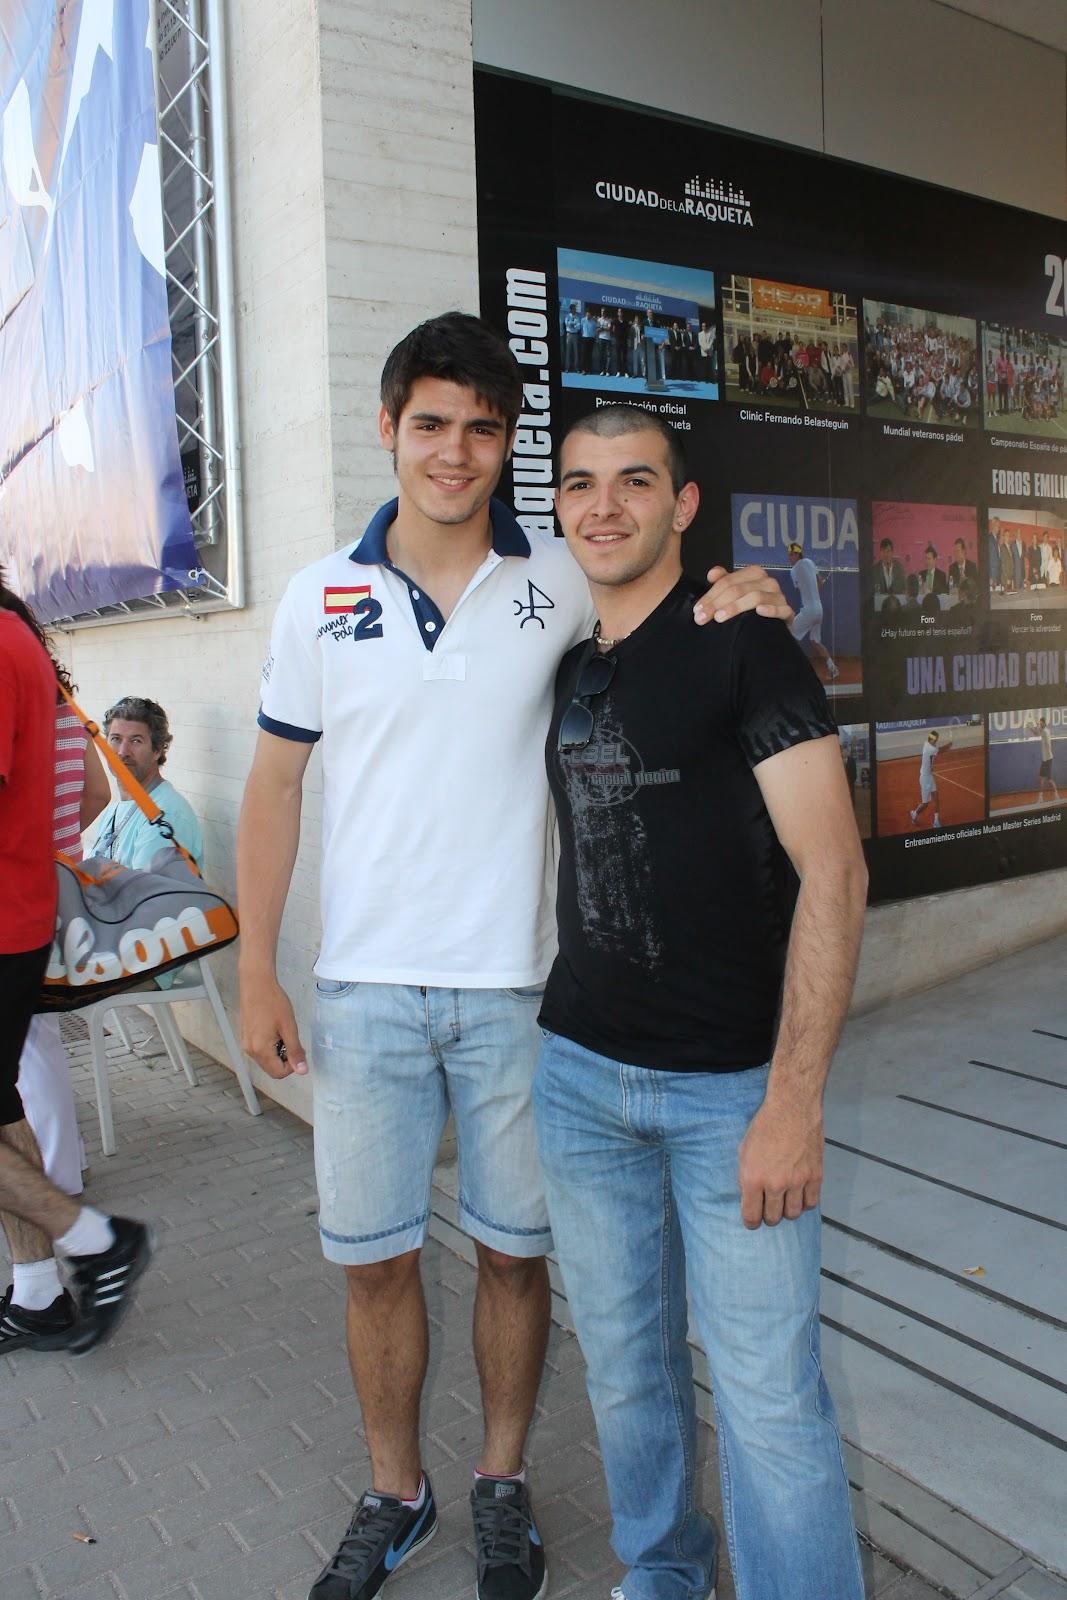 ¿Cuánto mide Álvaro Morata? - Altura - Real height Morata